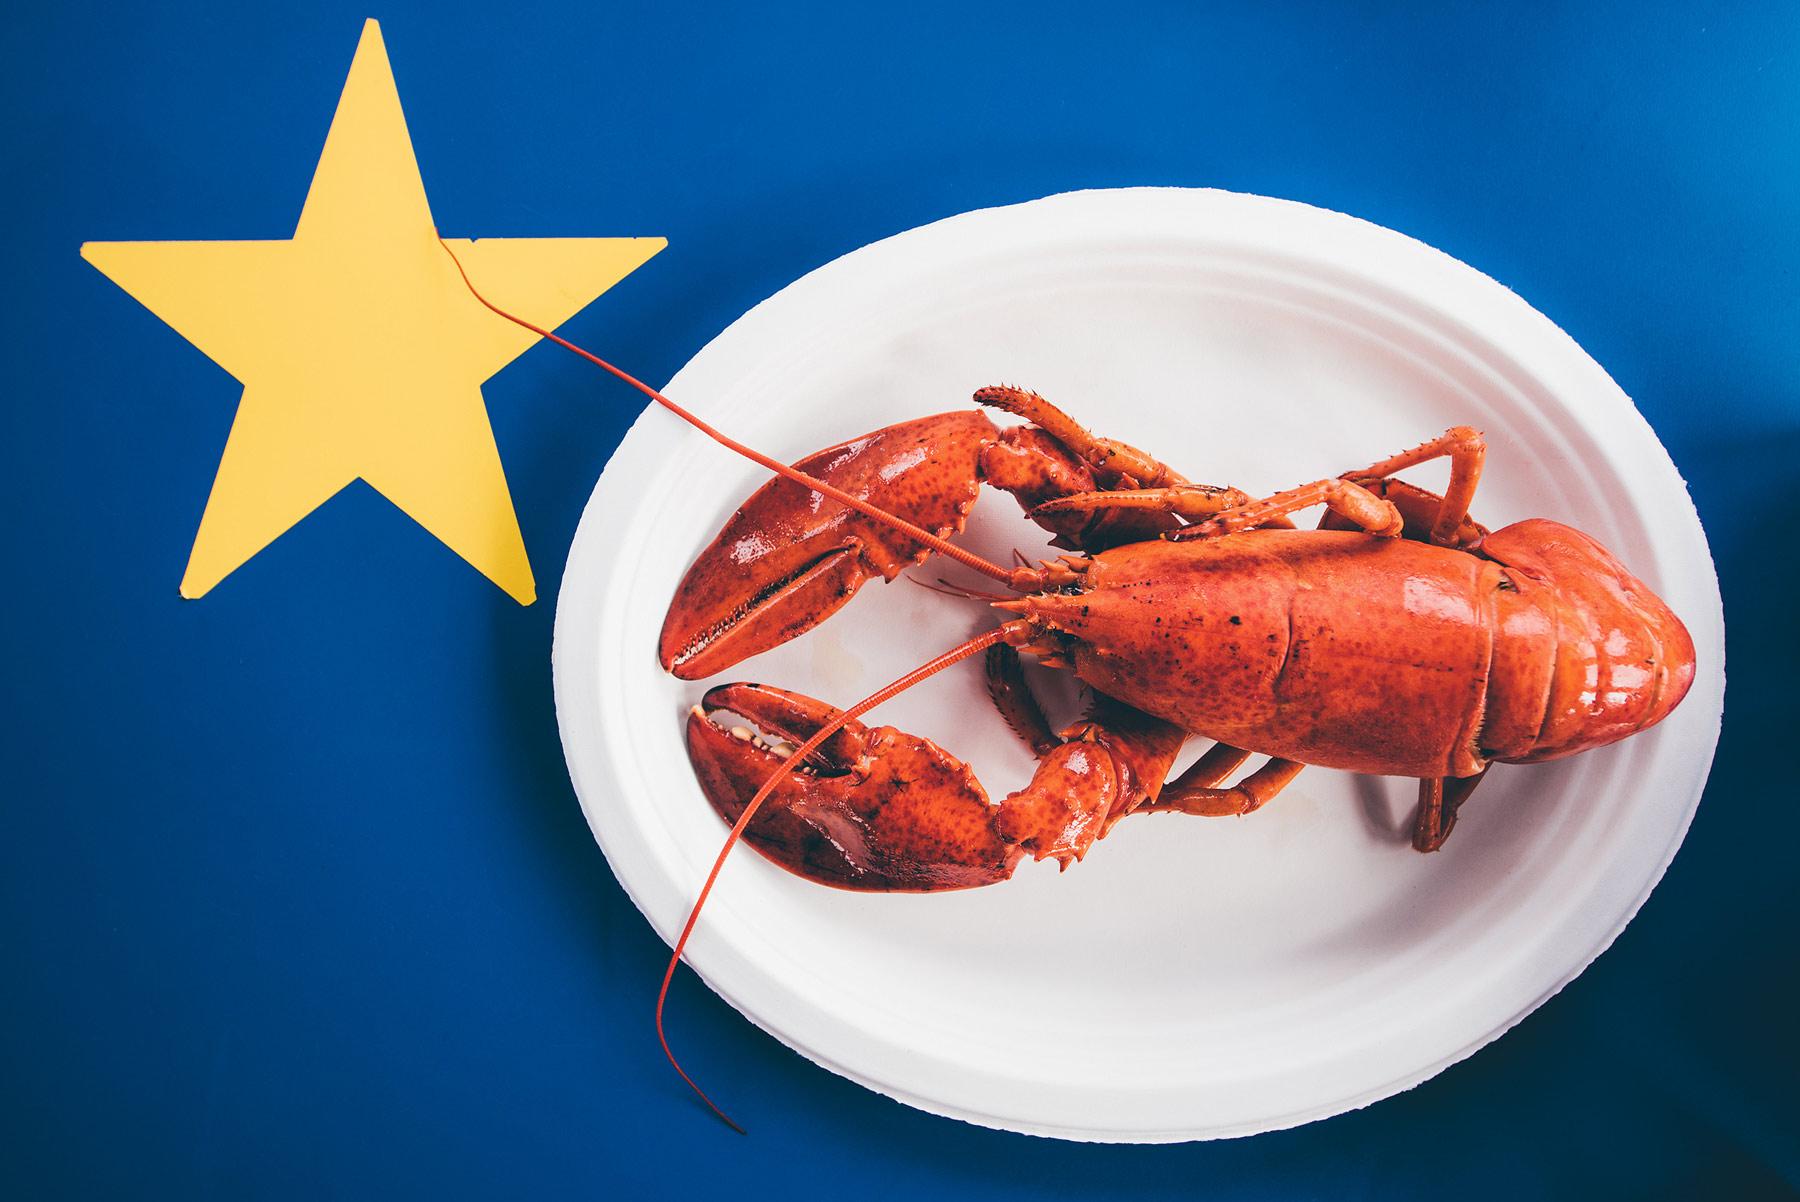 ou manger du homard canada